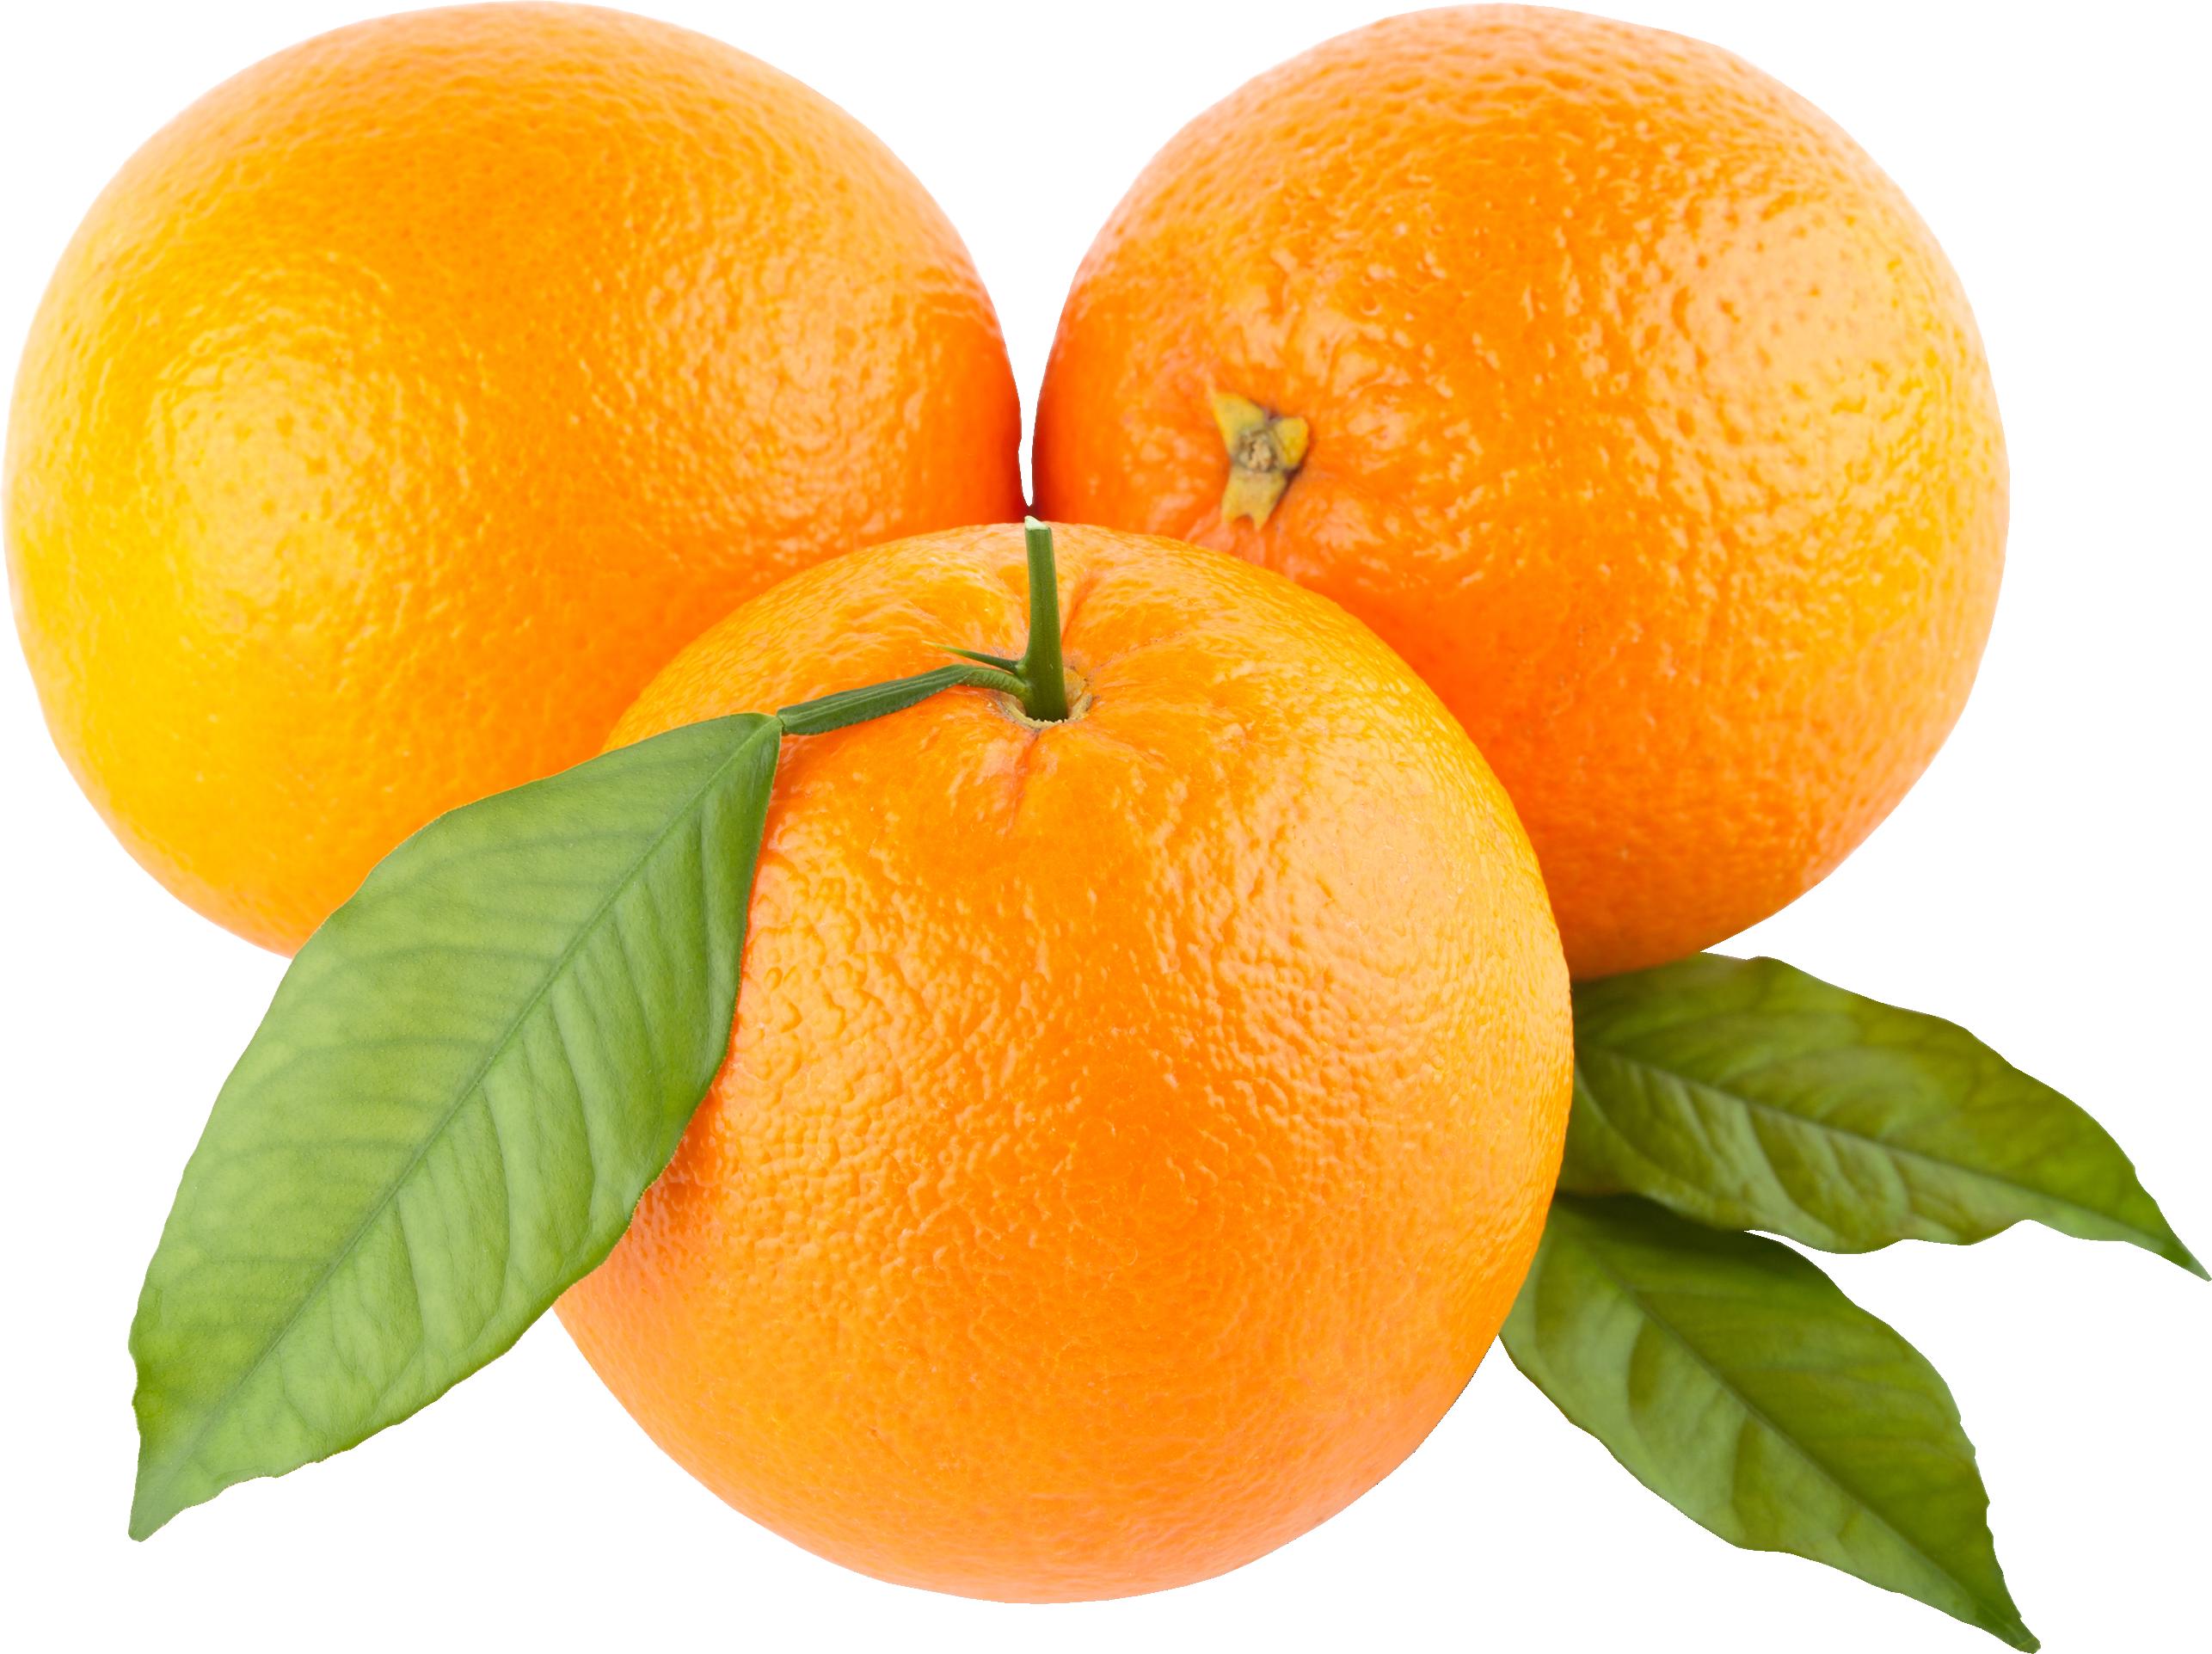 Png images free. Oranges image purepng transparent